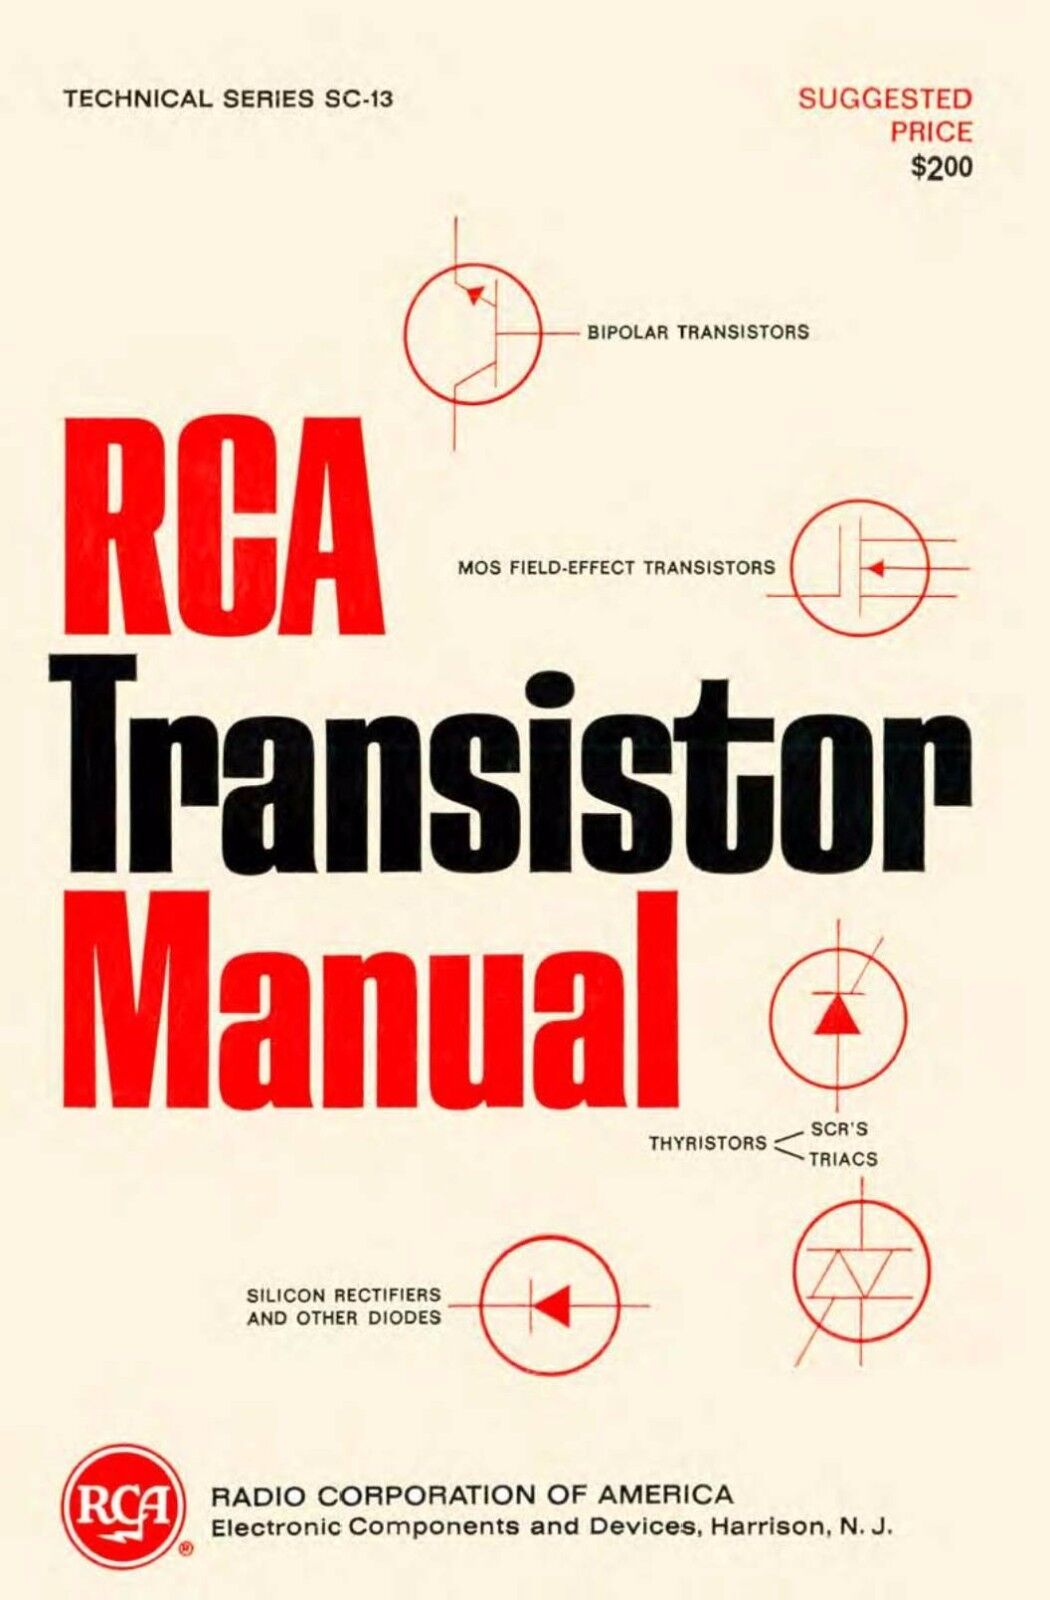 rca transistor manuals 5 manuals cdrom pdf. Black Bedroom Furniture Sets. Home Design Ideas